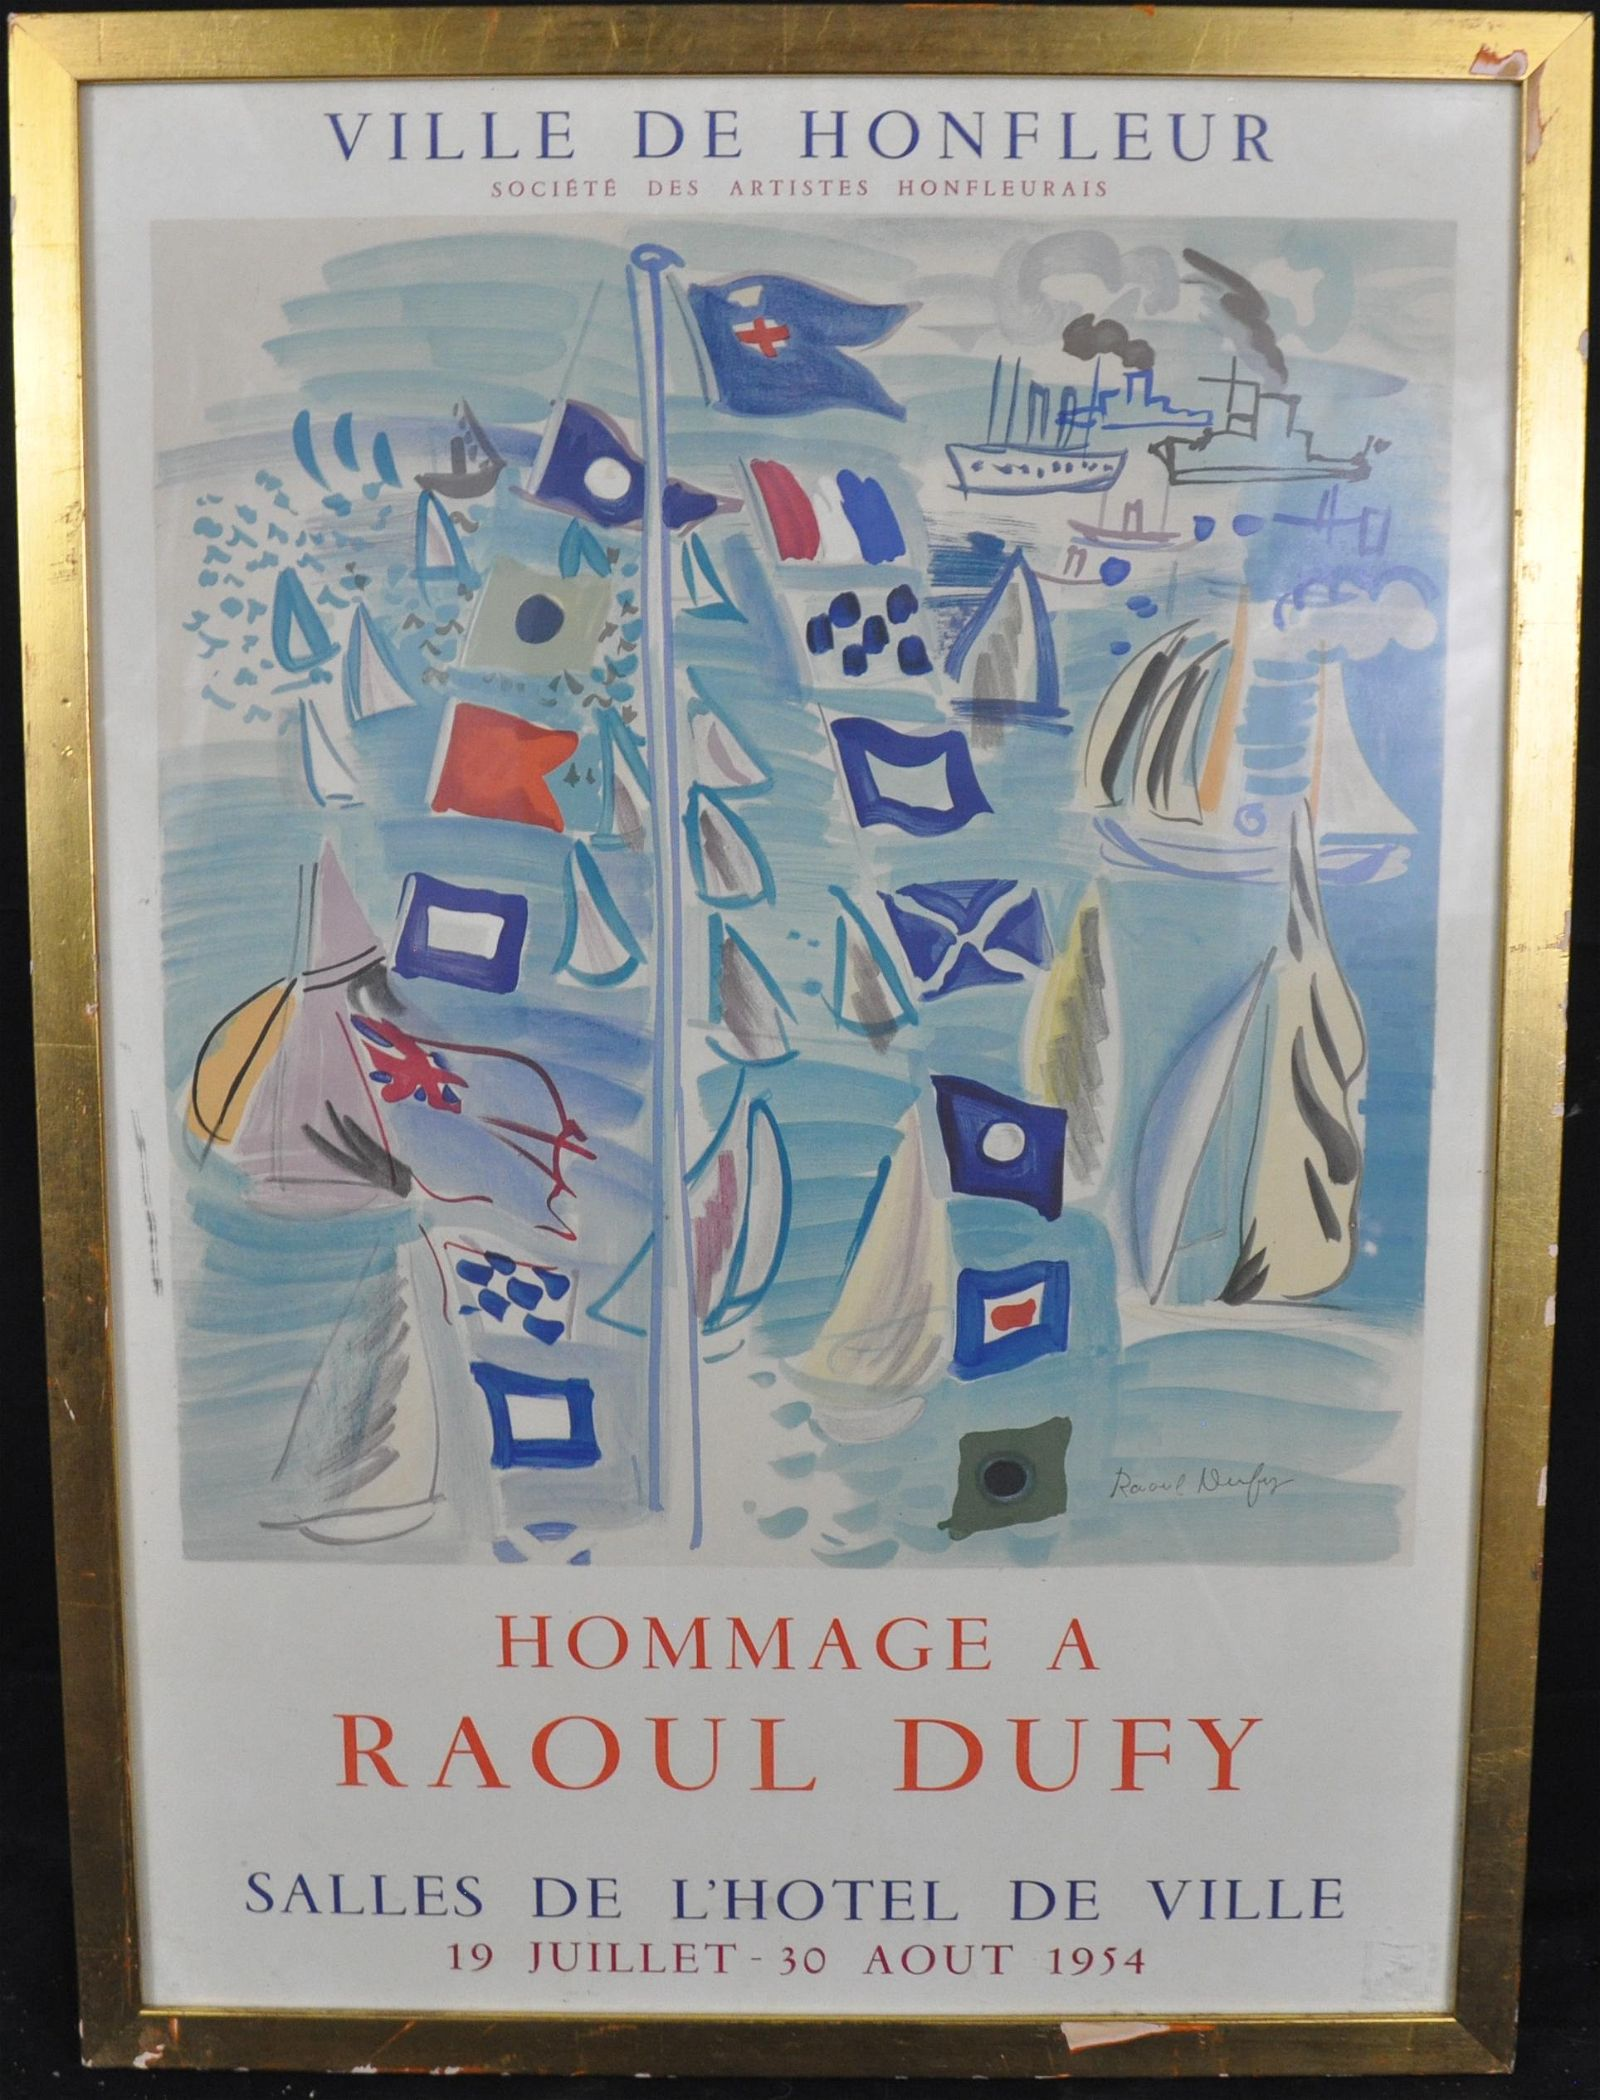 Raoul Dufy, original Lithographic Poster